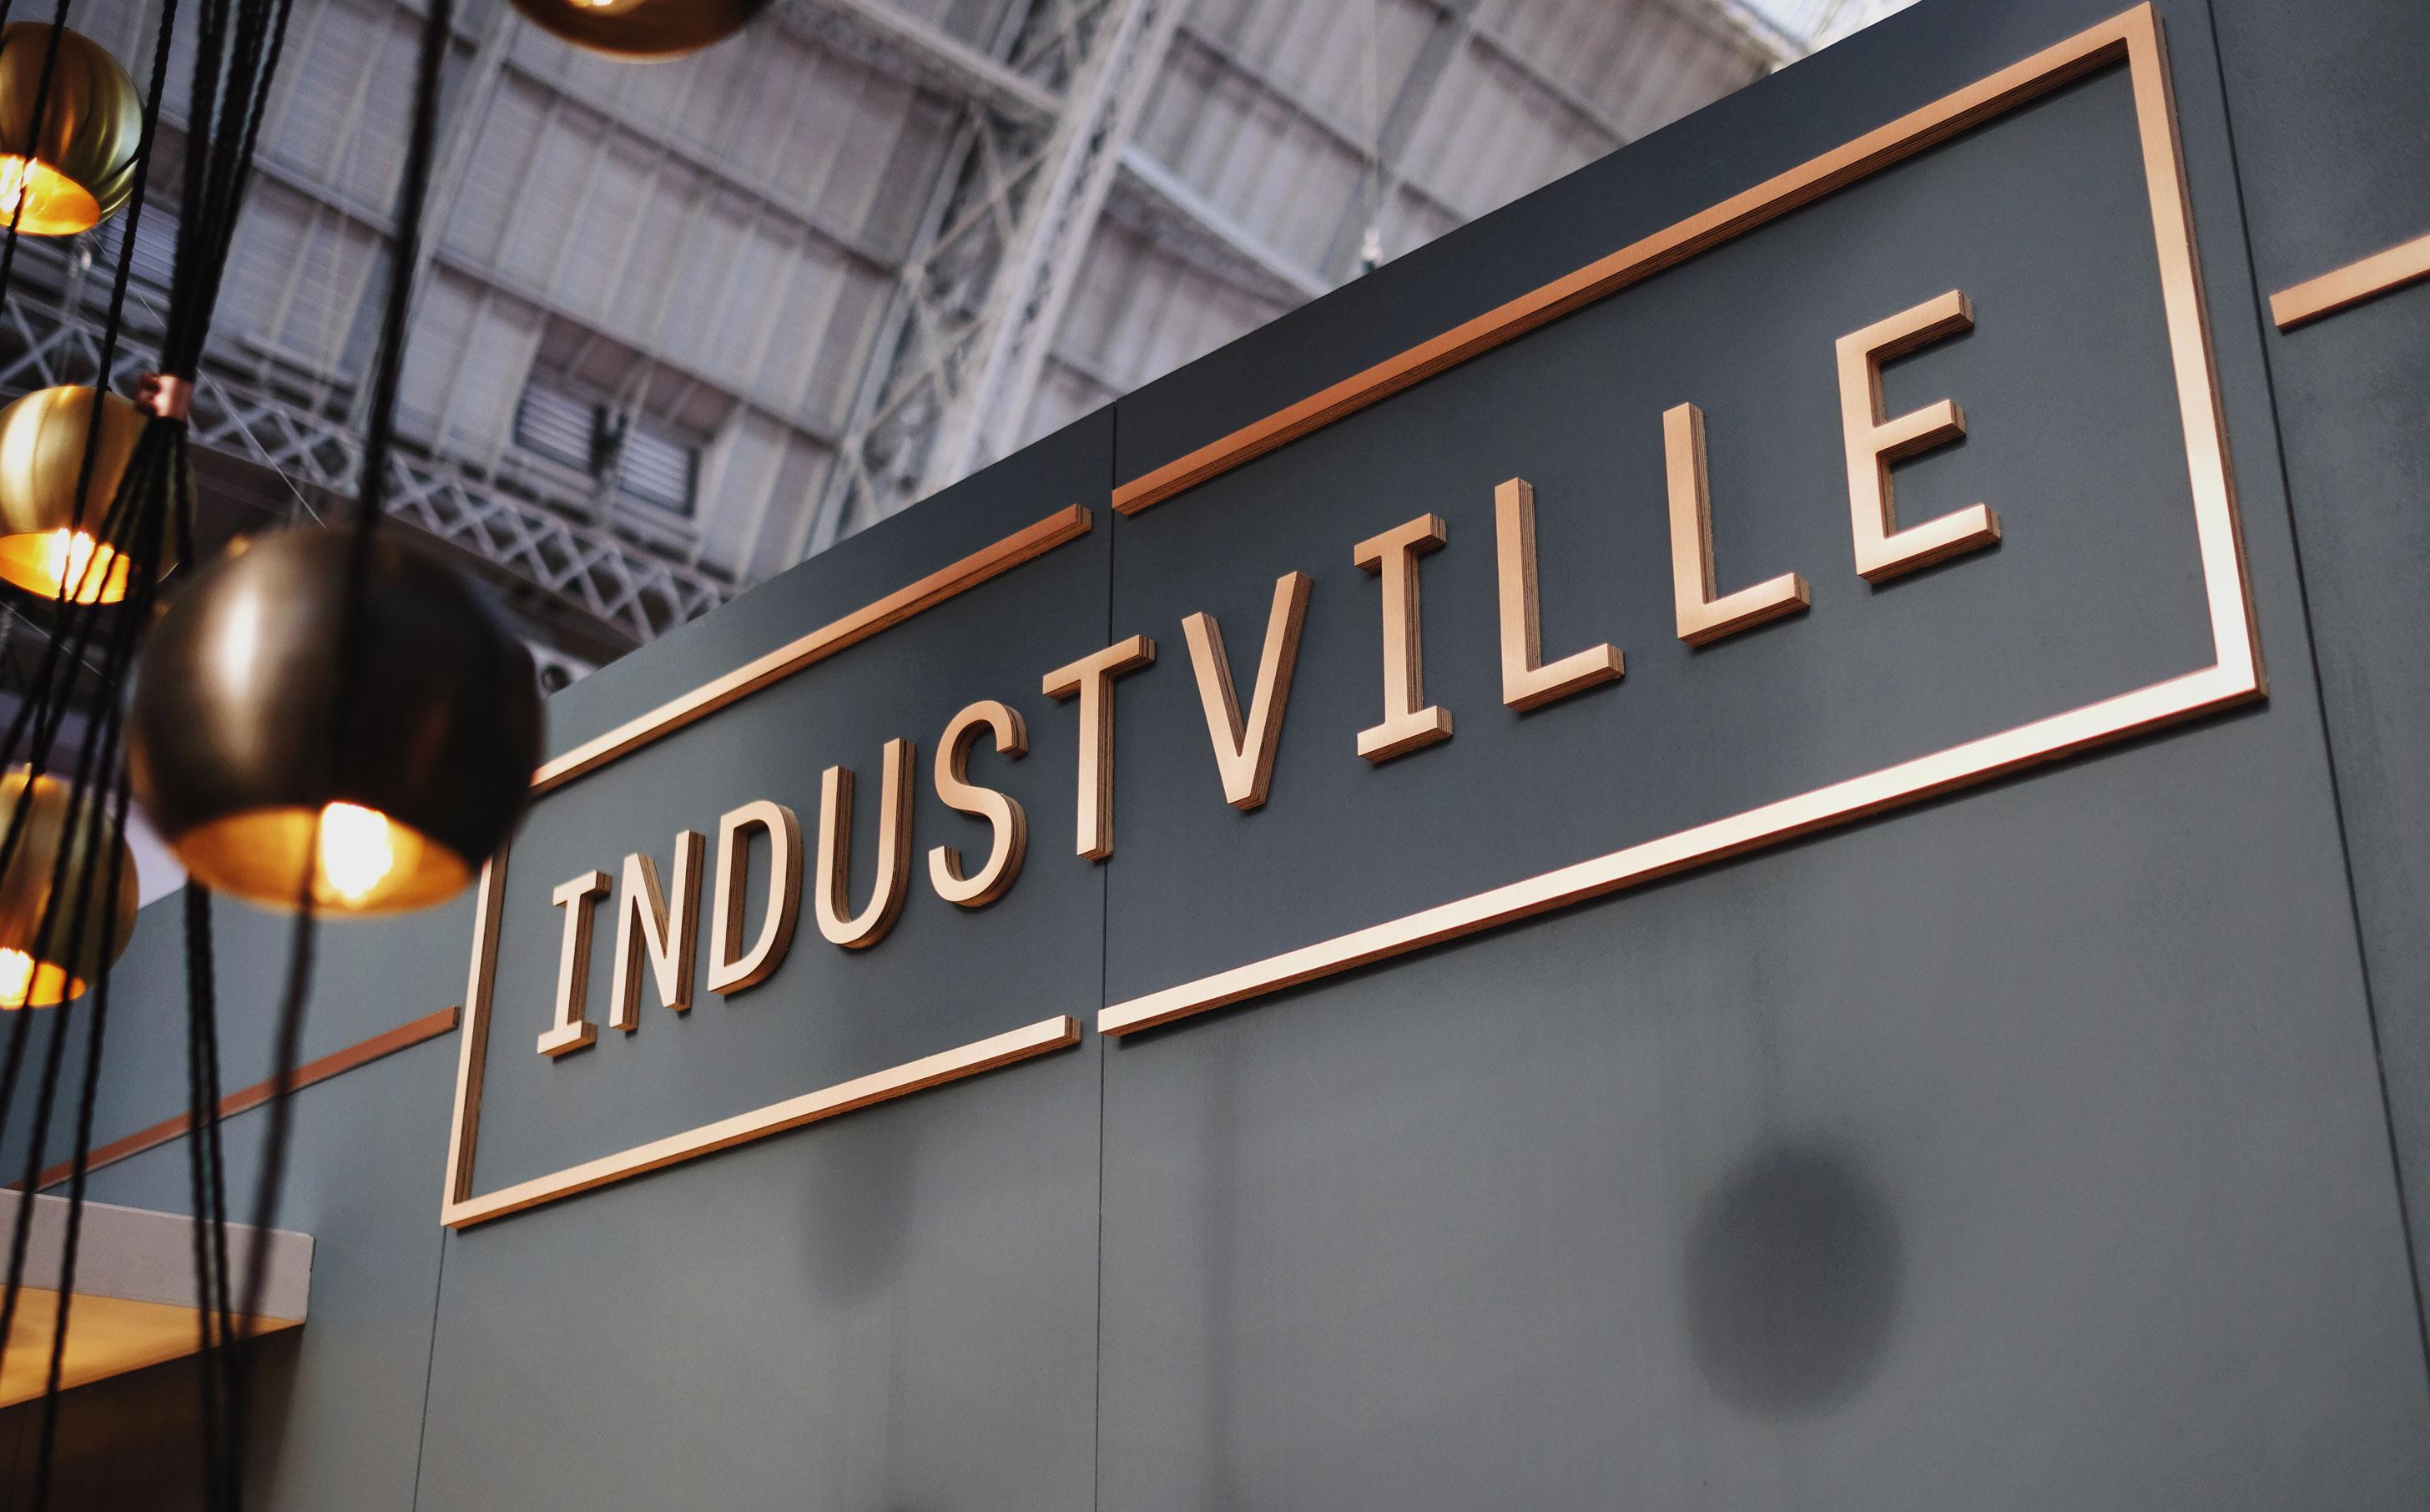 industville-signage-design-branding